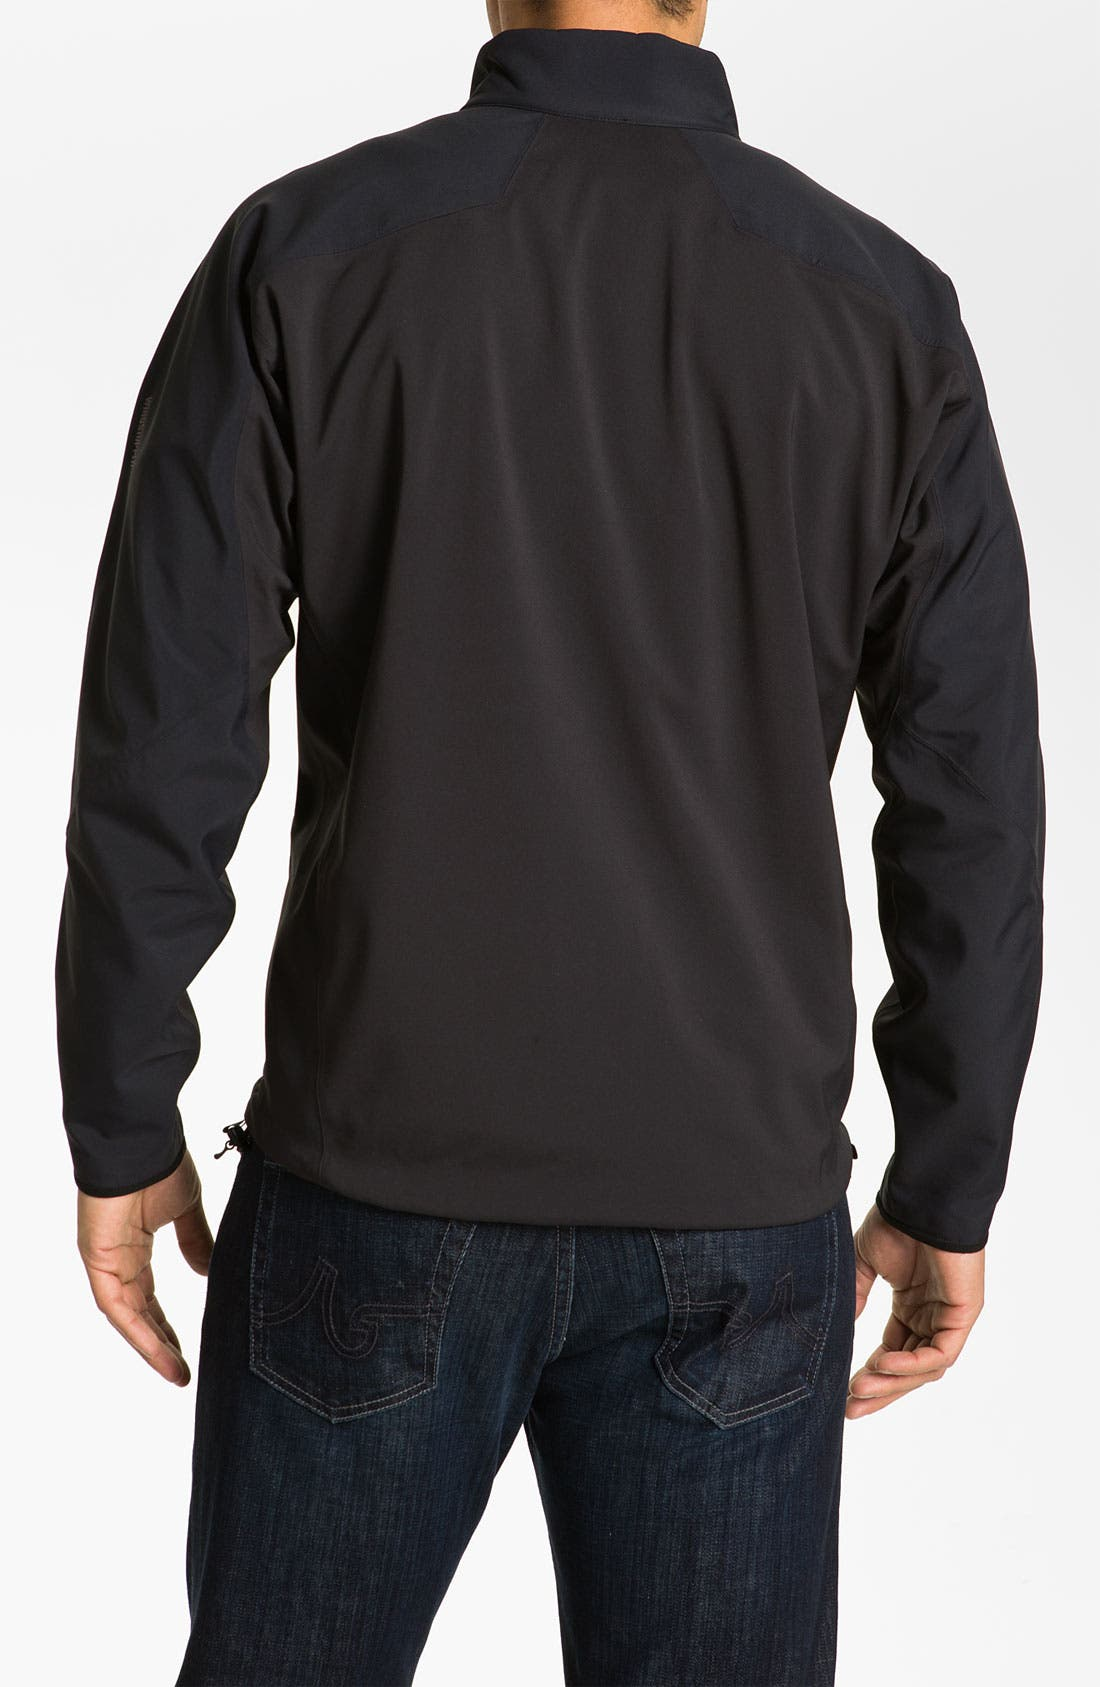 Alternate Image 2  - Arc'teryx 'Venta AR' Athletic Fit Soft Shell Jacket